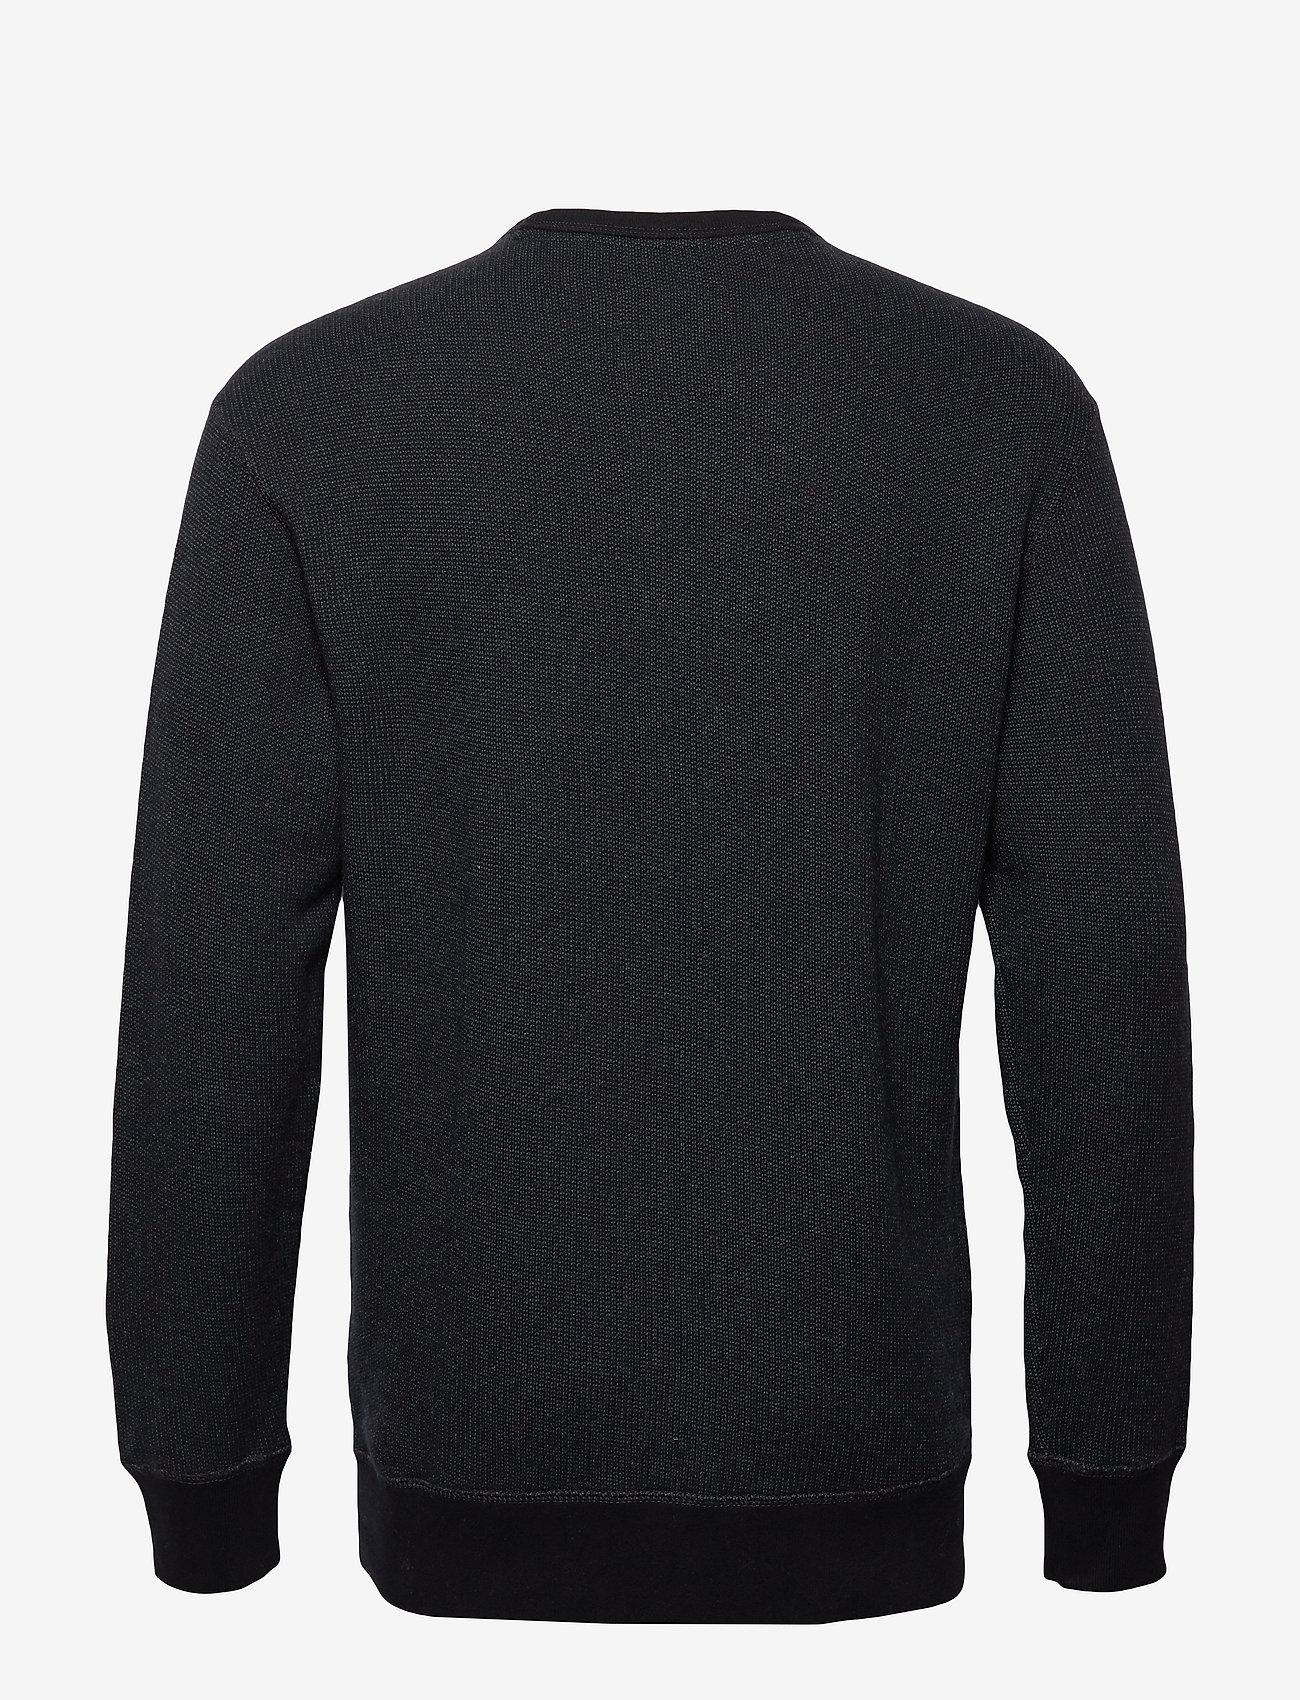 Hollister Crewneck Sweatshirt - Sweatshirts Black Dd